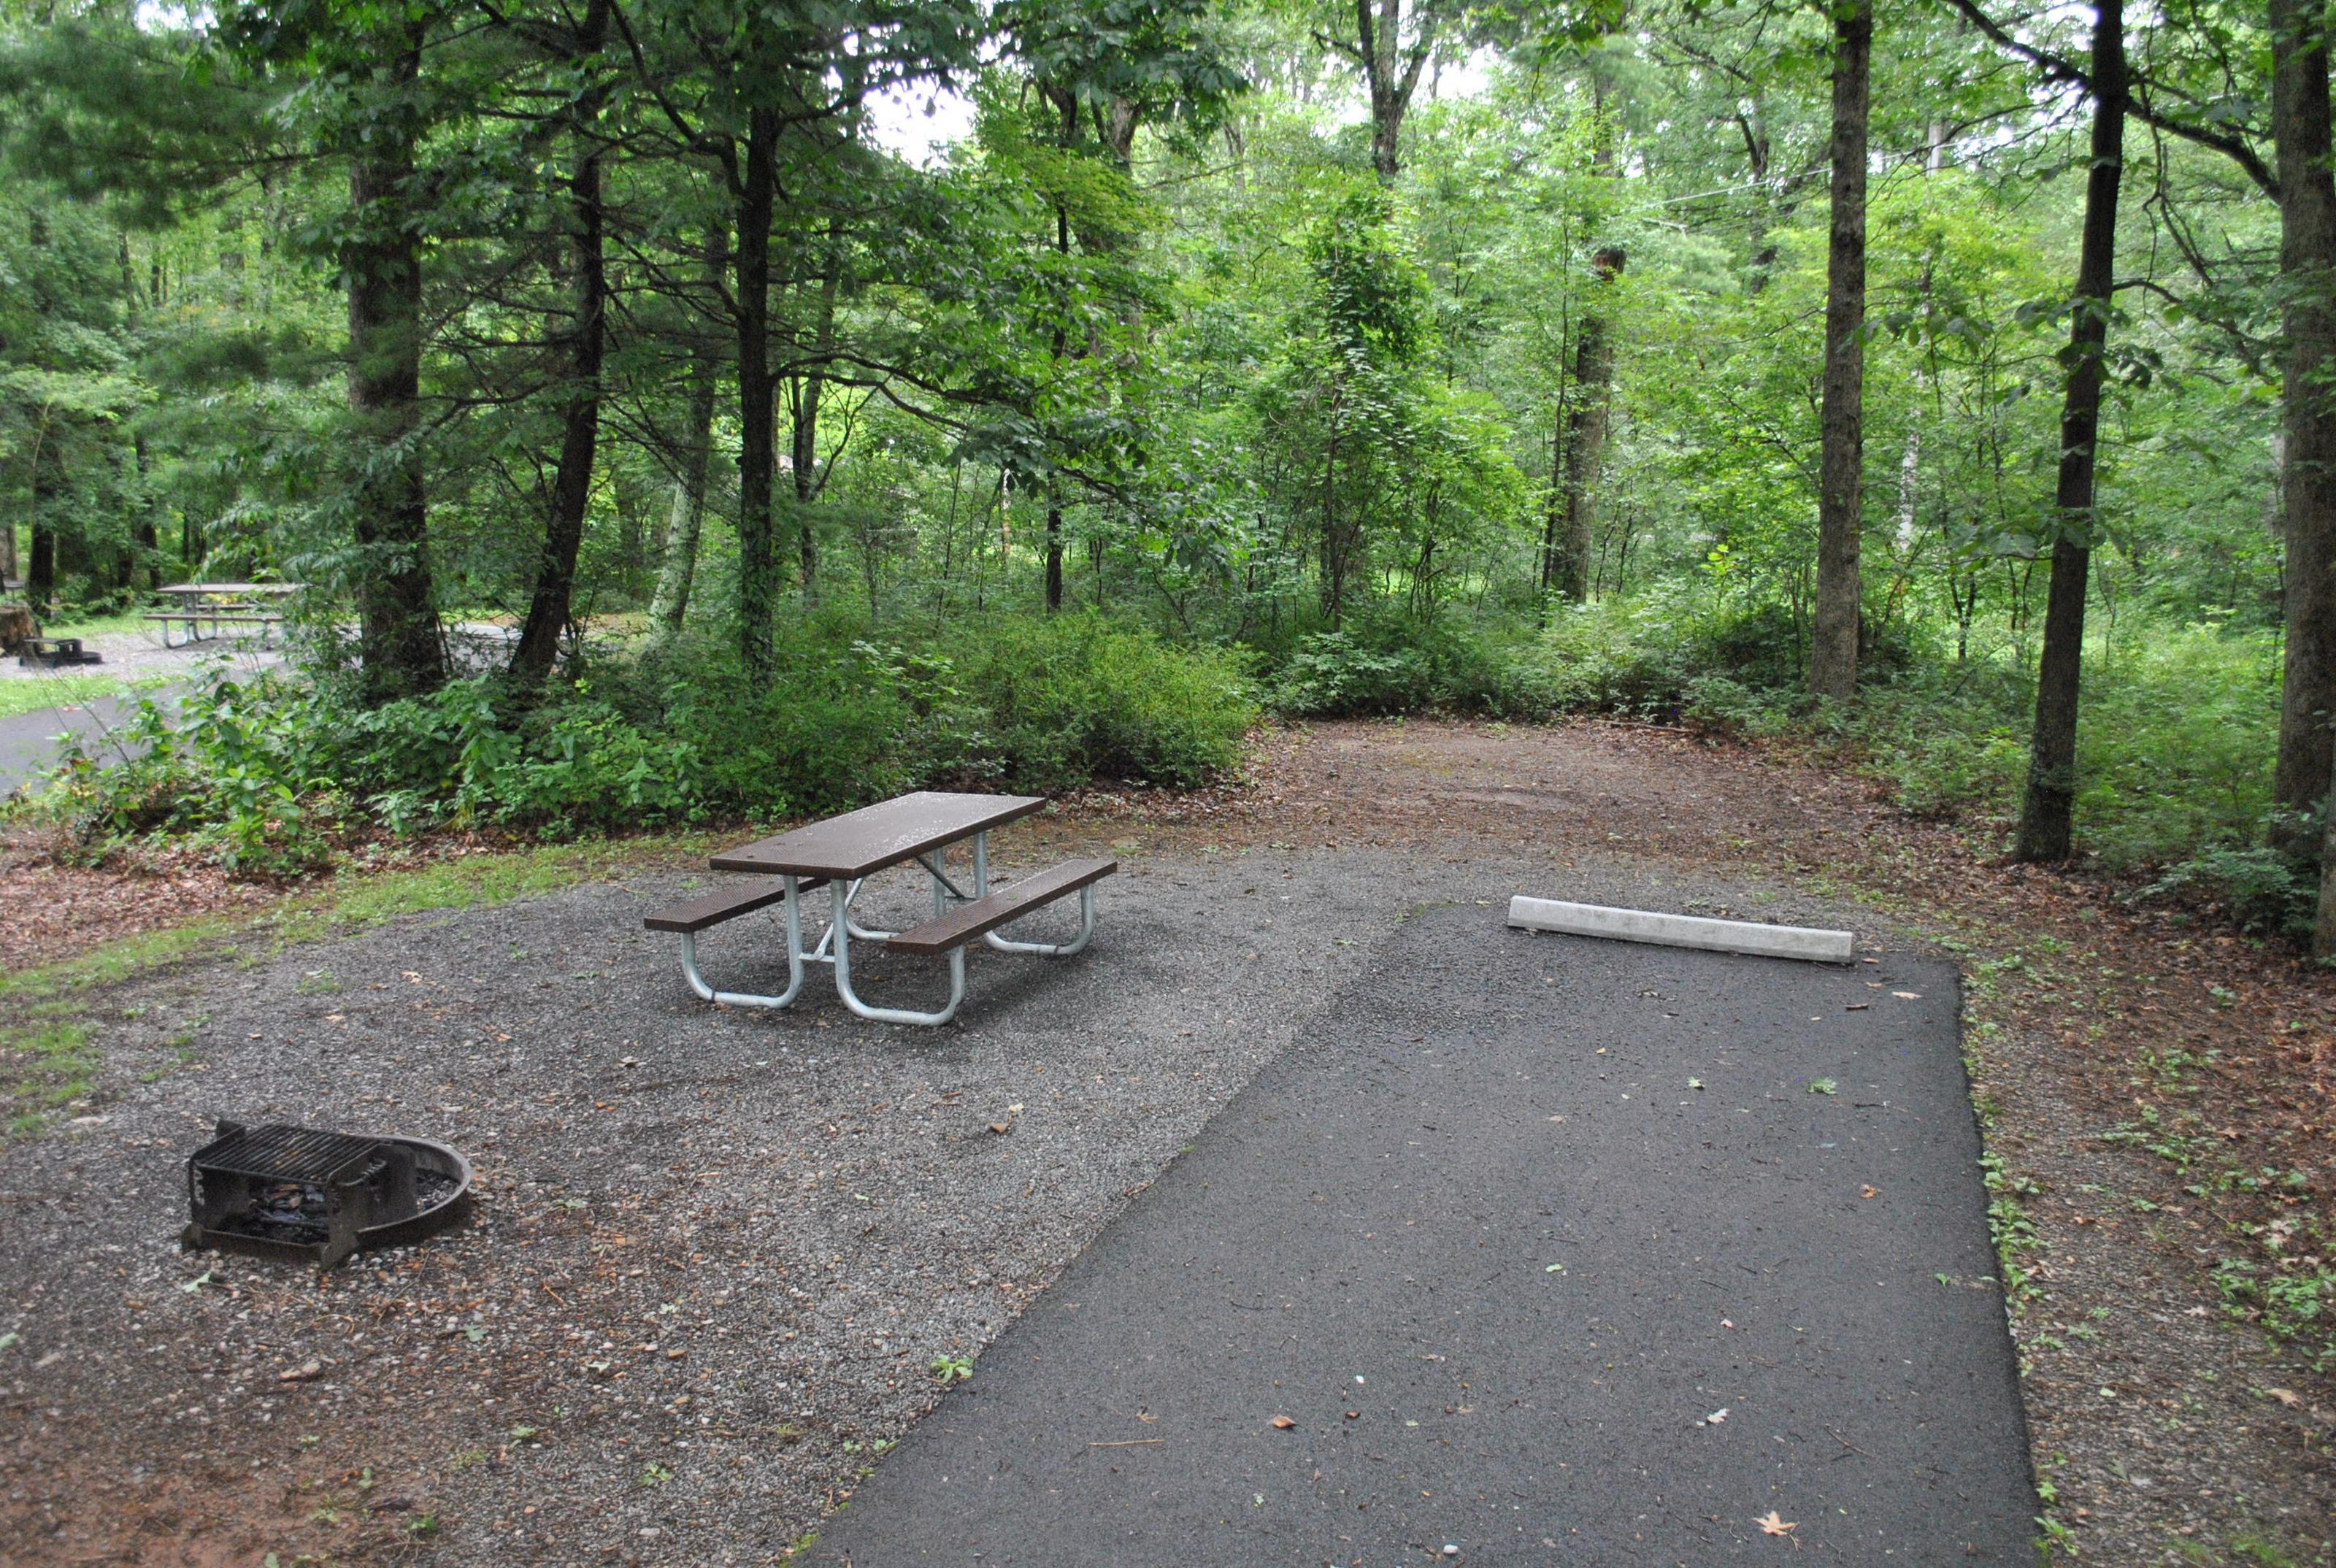 Mathews Arm Campground – Site A012